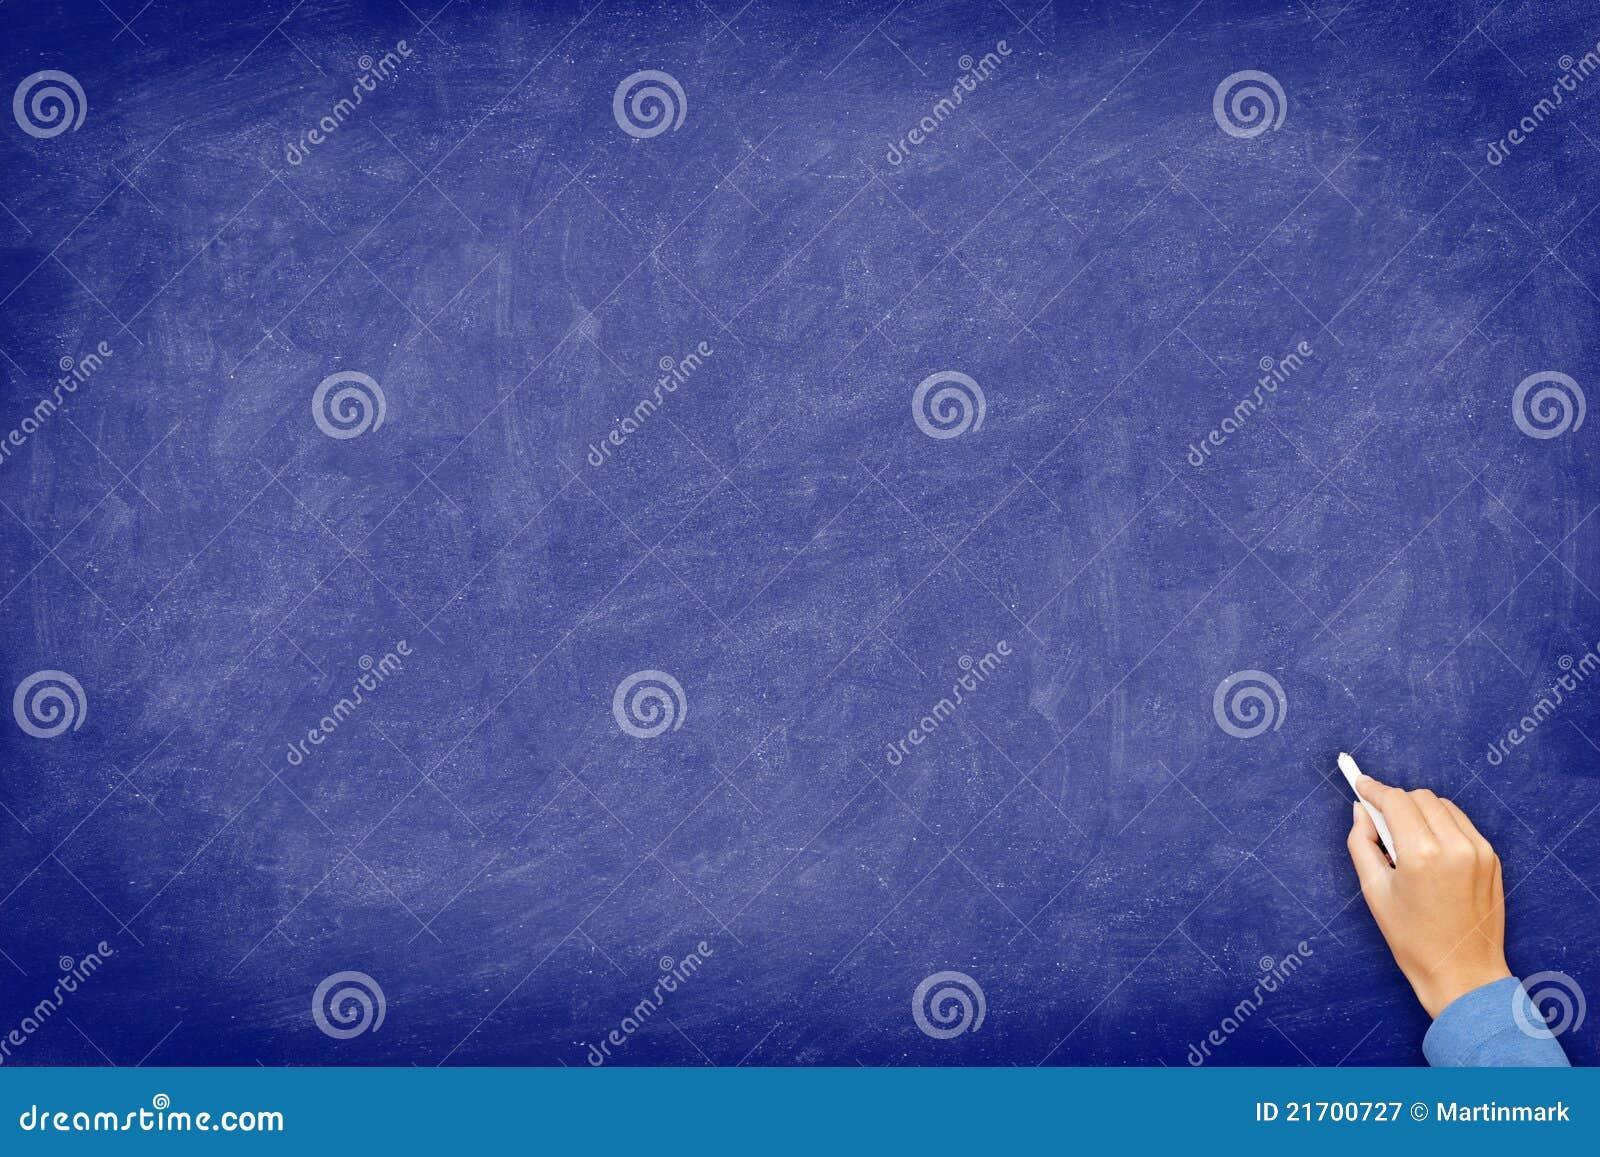 chalkboard blue blackboard with hand stock image image of blue